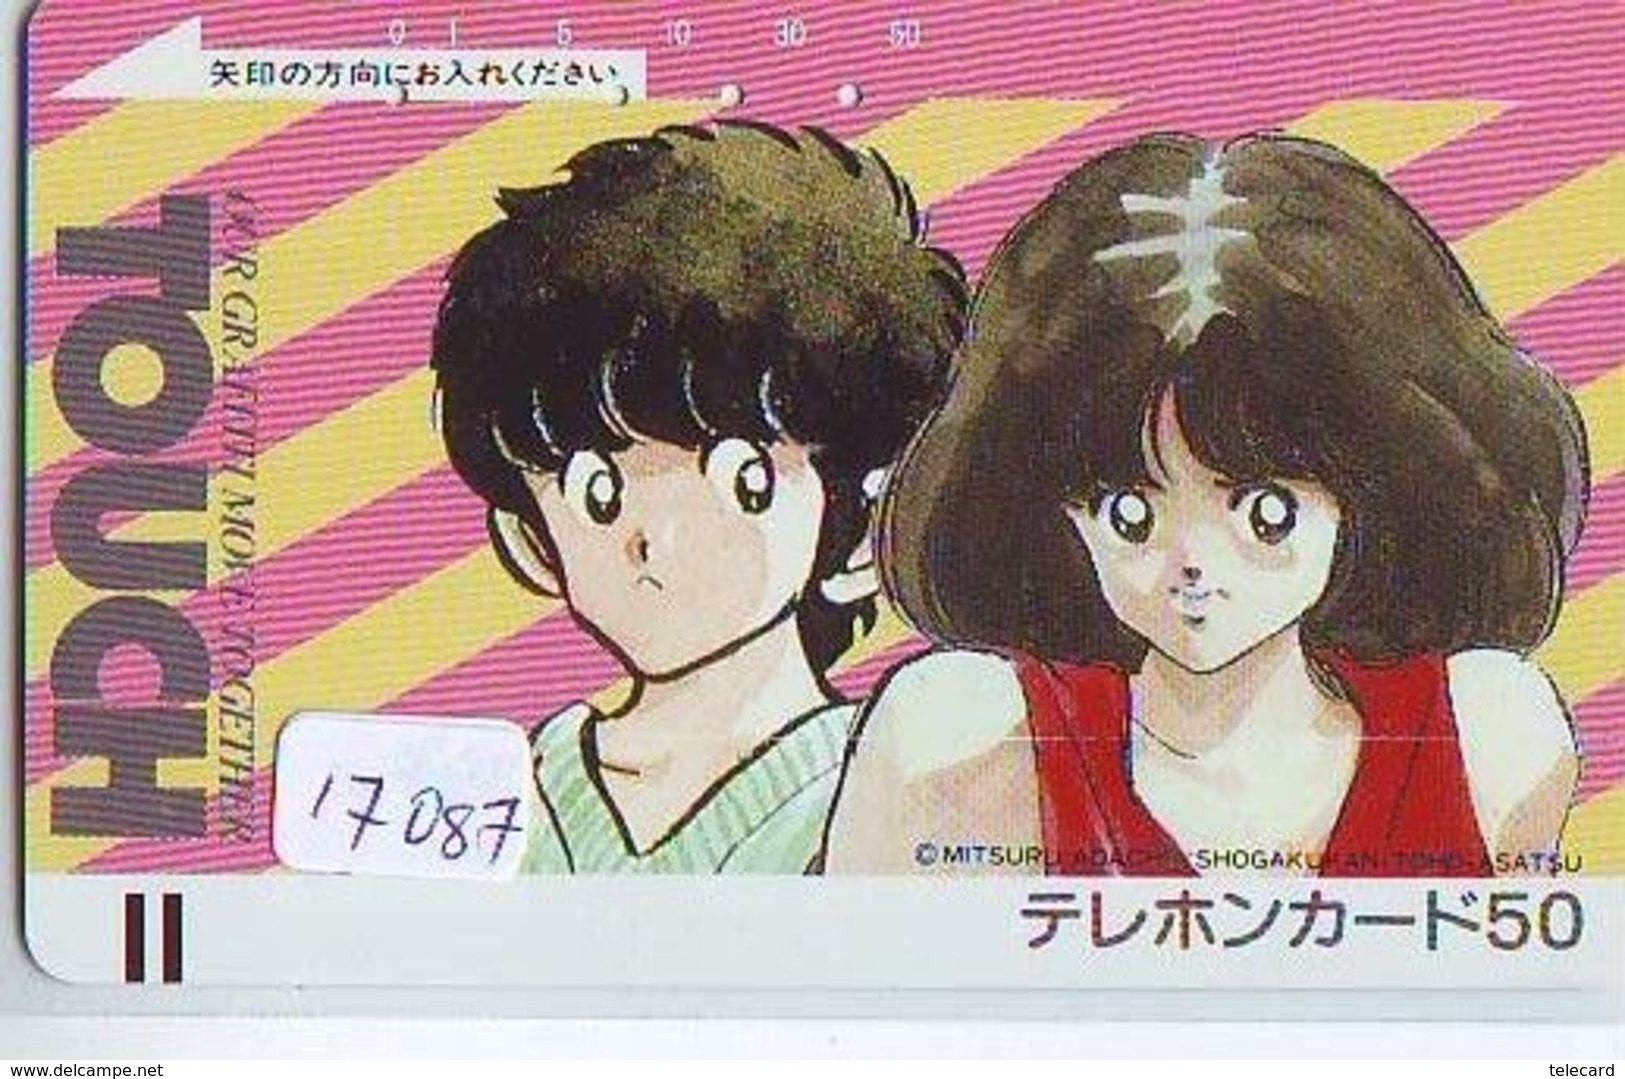 Télécarte Japon * 110-4226 *  TOUCH * ANIME Japan (17.087) FRONT BAR Phonecard Balken TK - BD